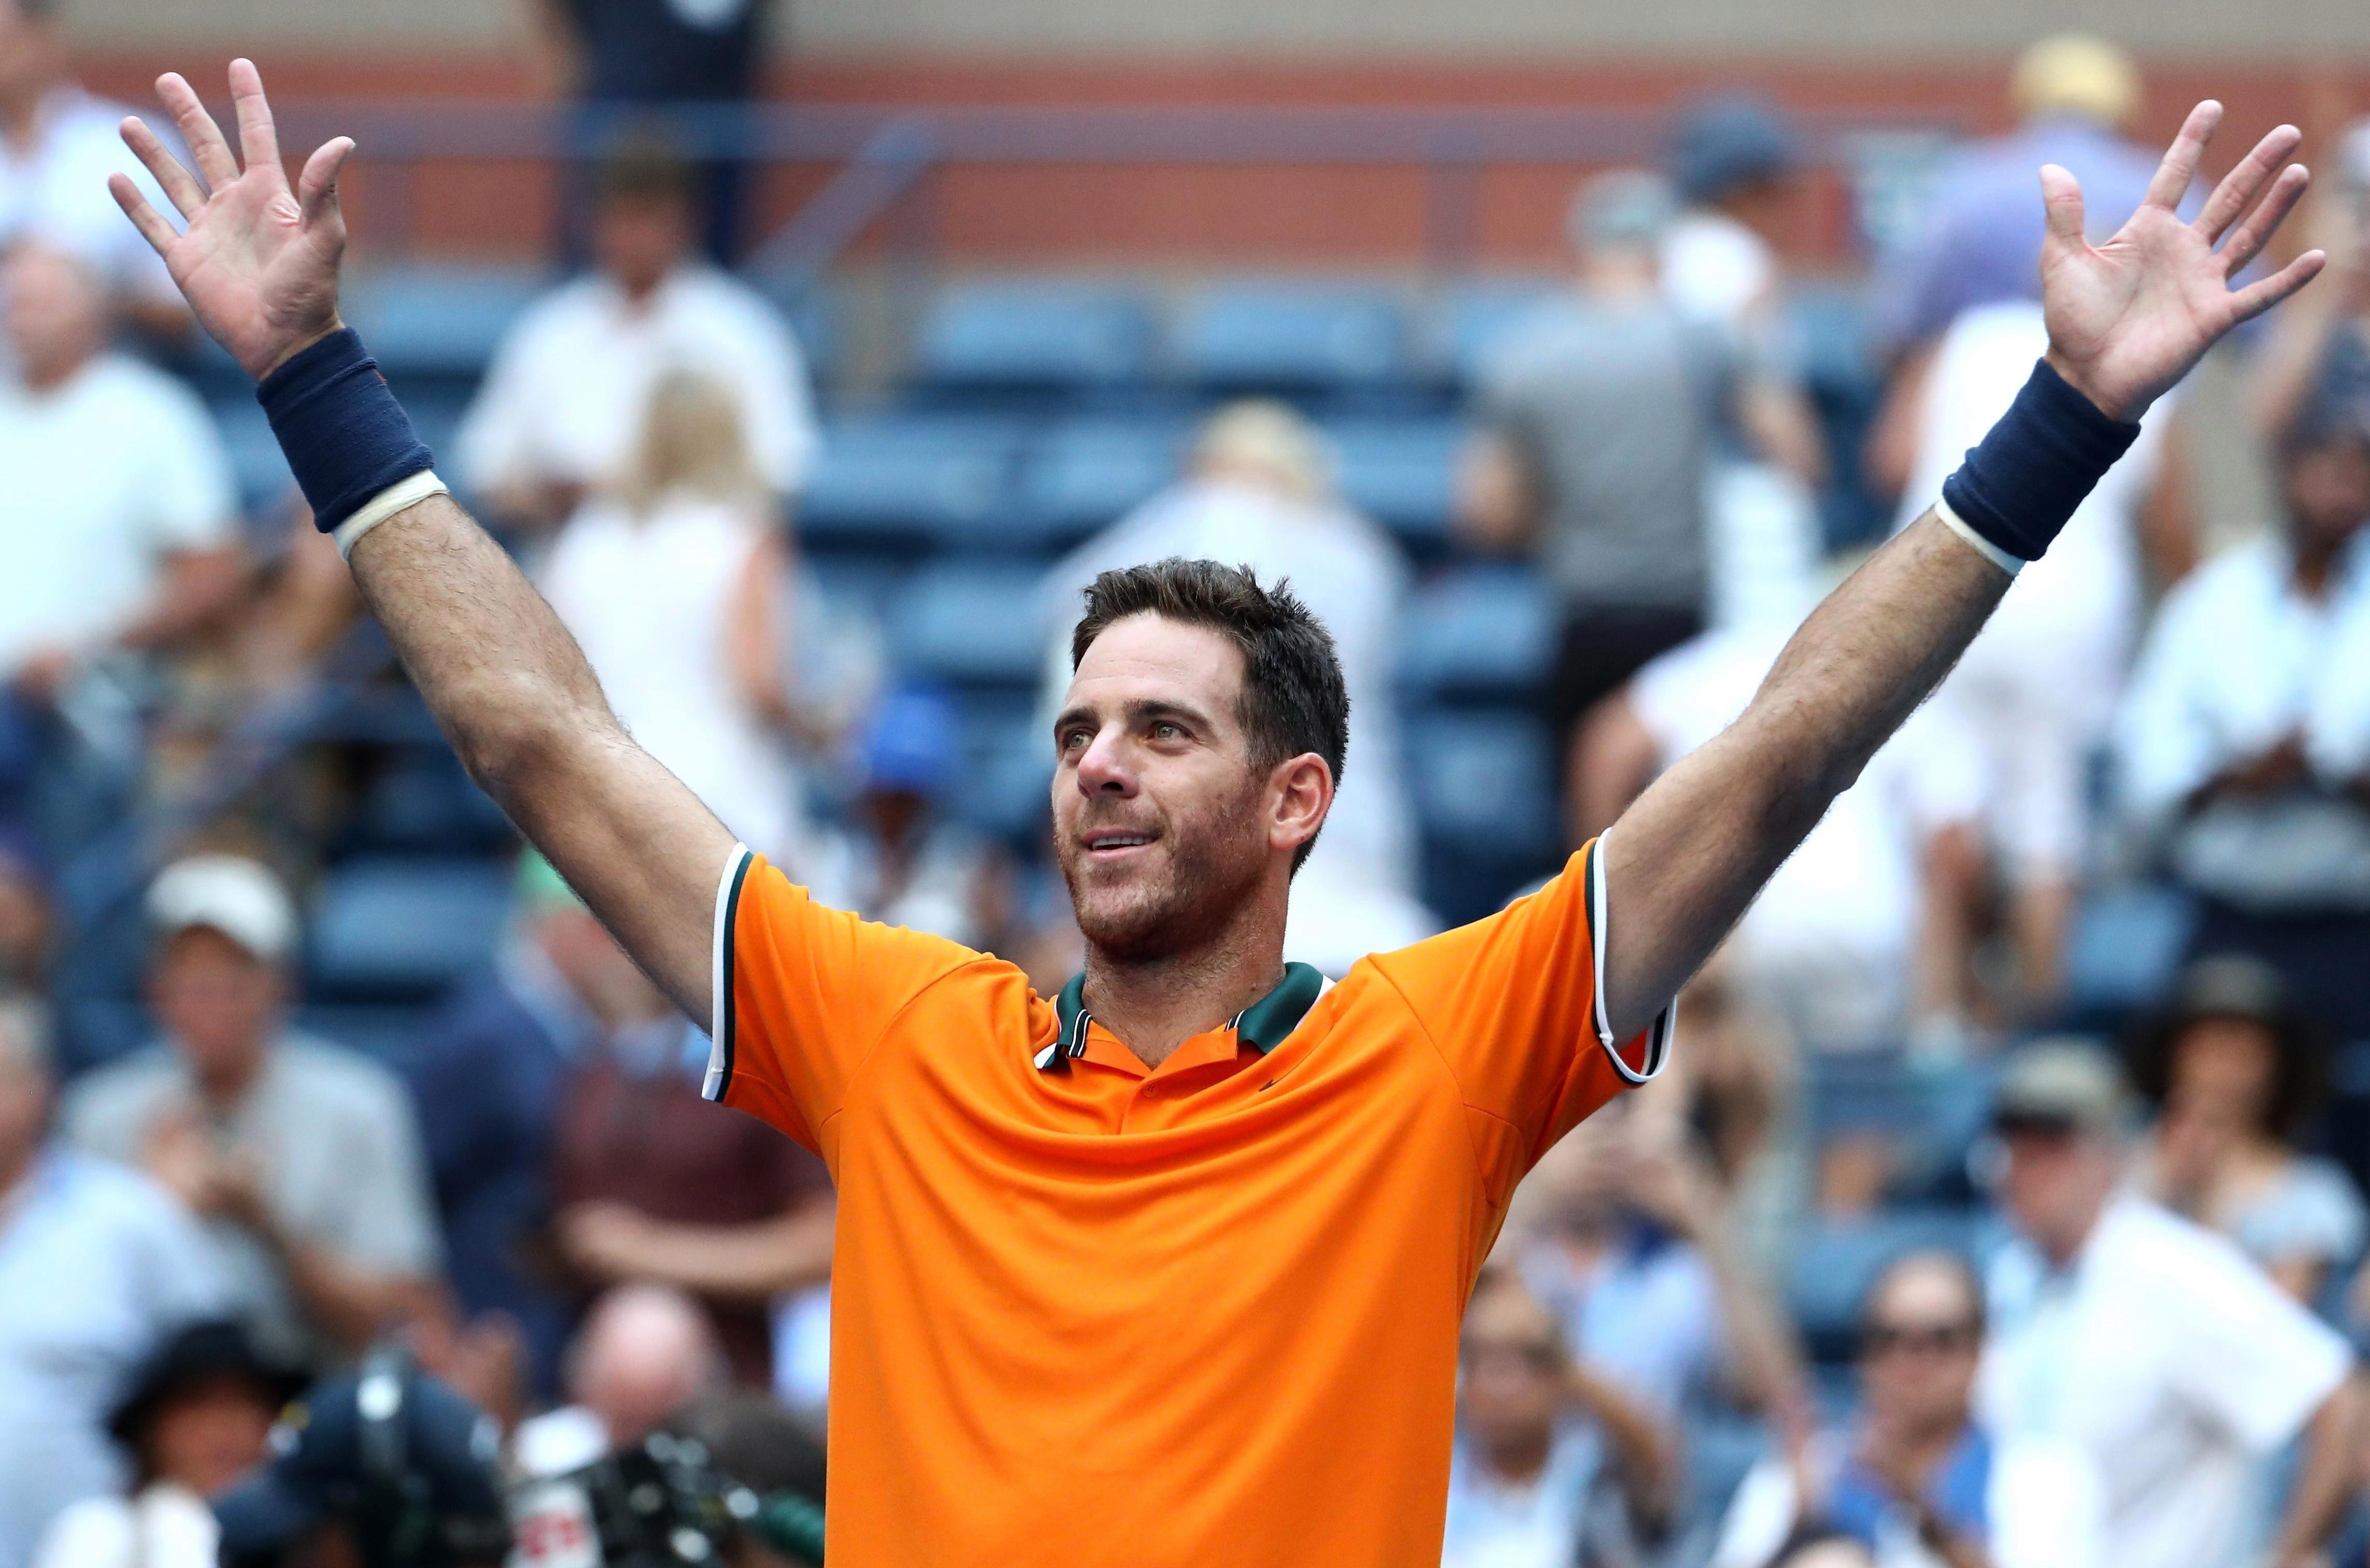 Argentina's Juan Martin del Potro has won just one Grand Slam, the 2009 US Open